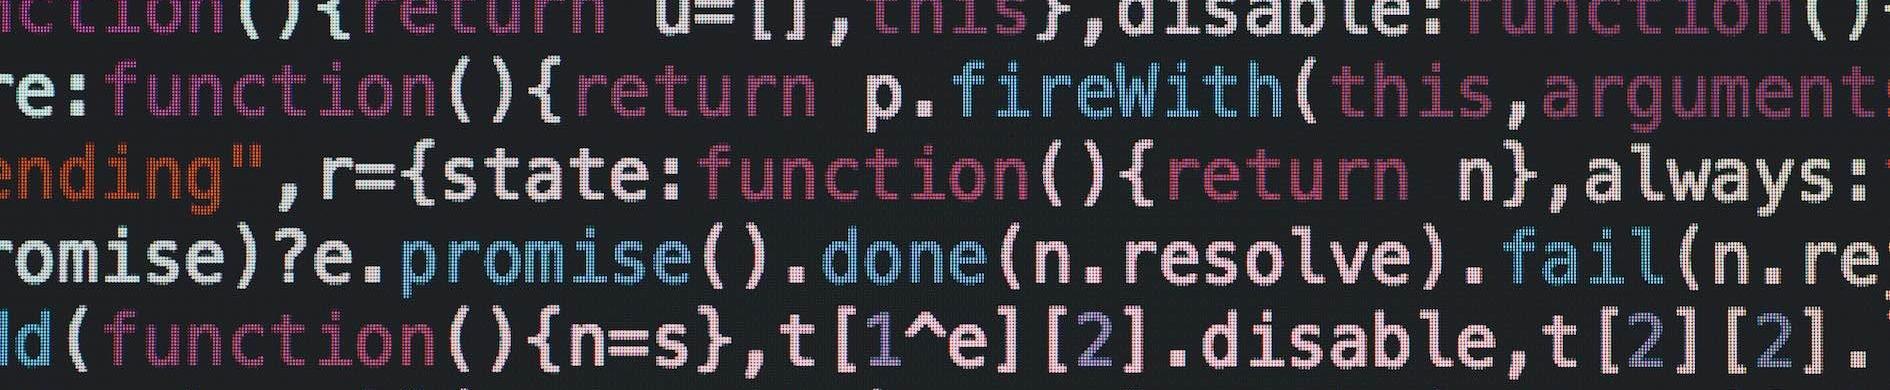 machine learning data scientist best resume samples